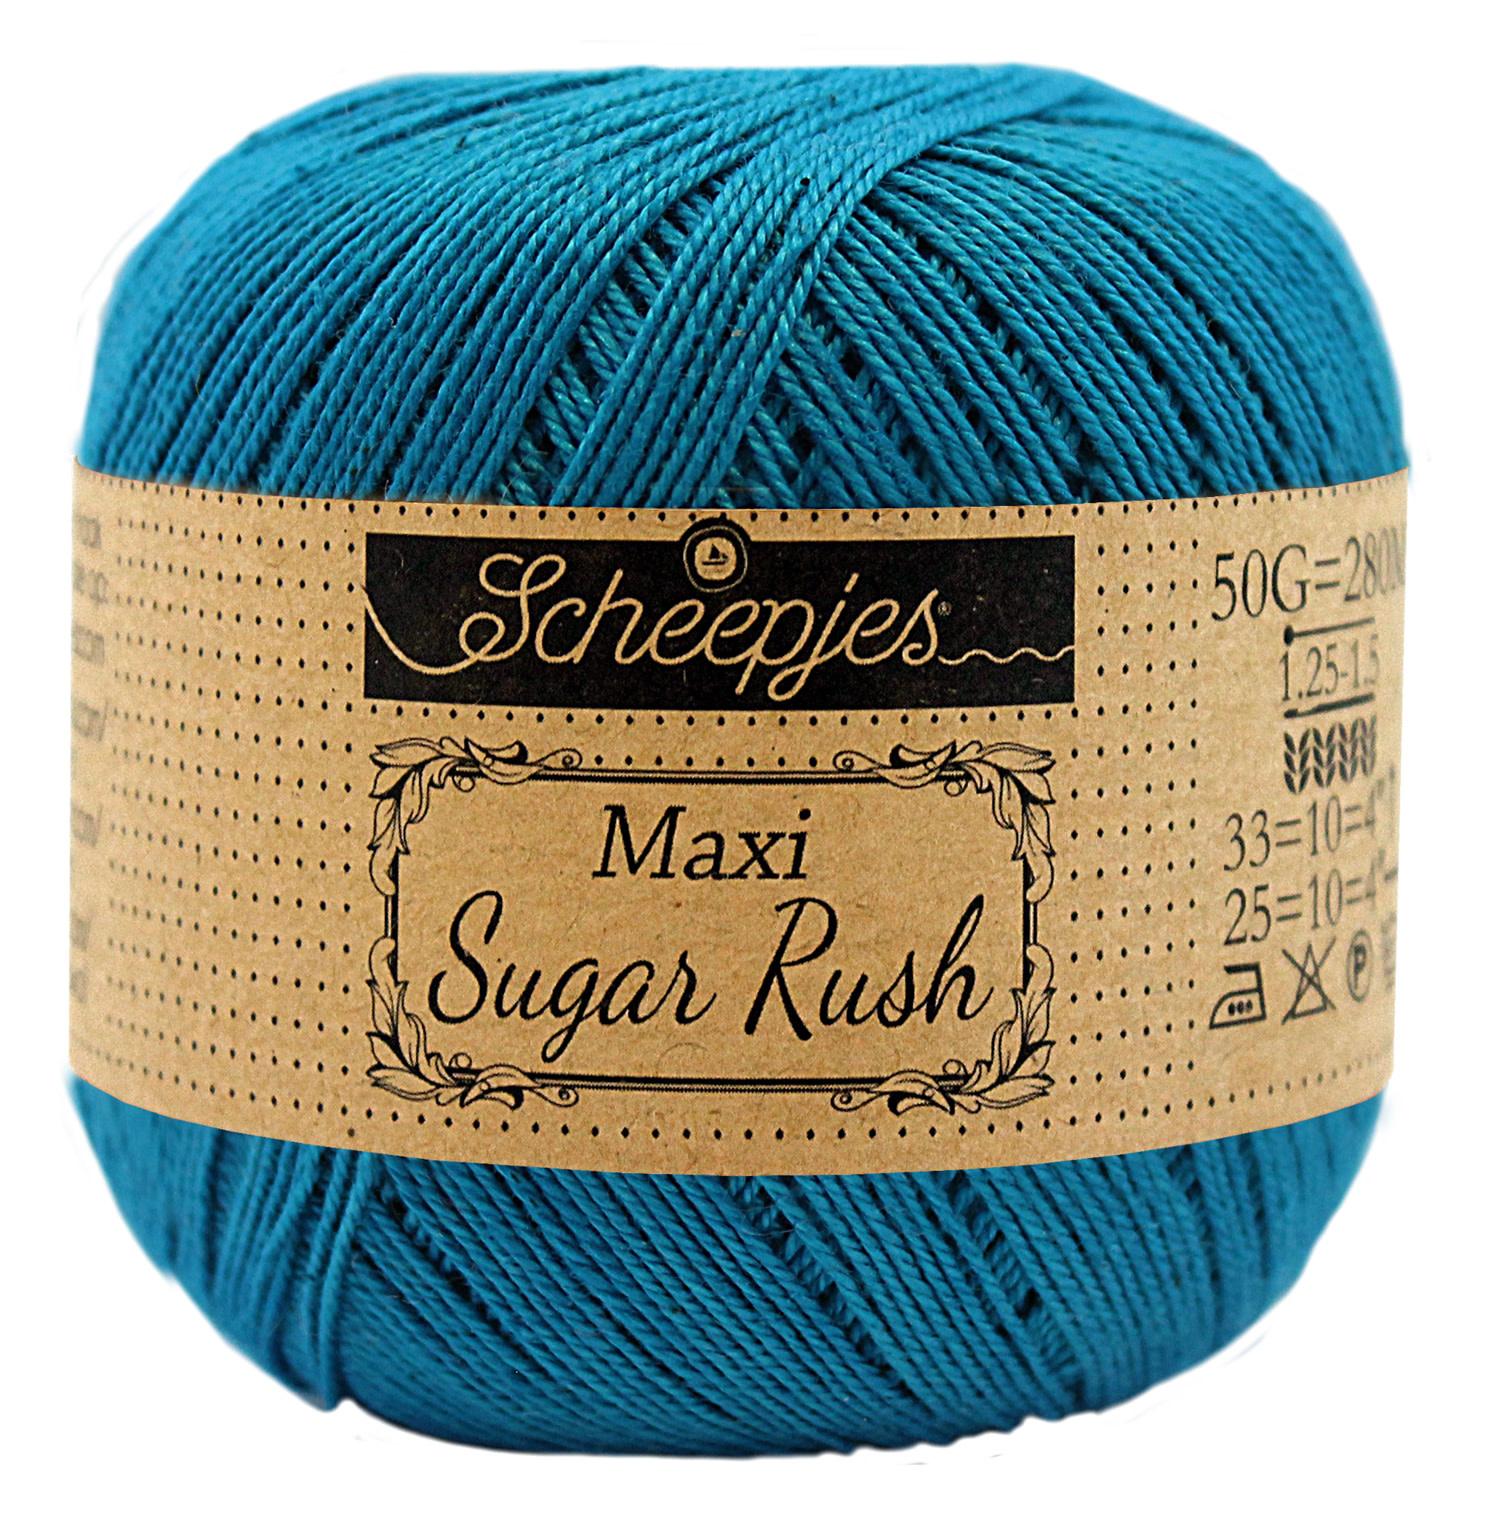 Scheepjes MAXI SUGAR RUSH - PETRON BLUE 400